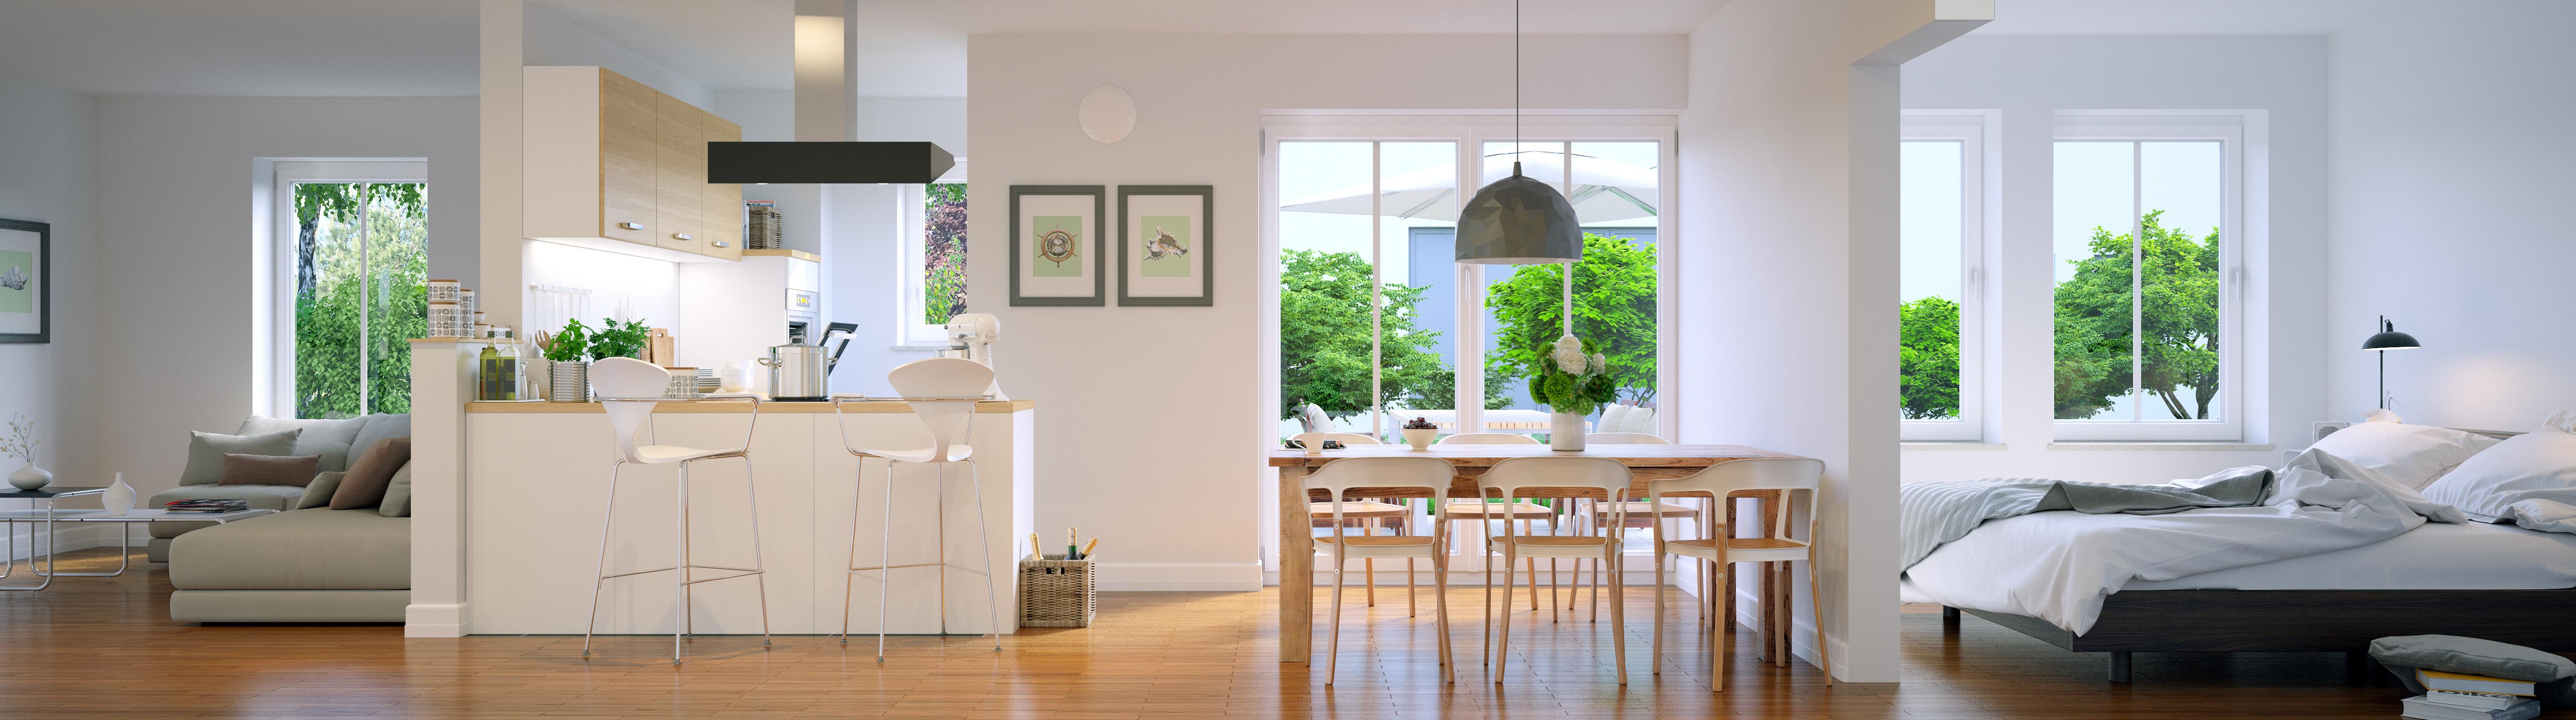 5 Principles of Interior Design: Synchronisation